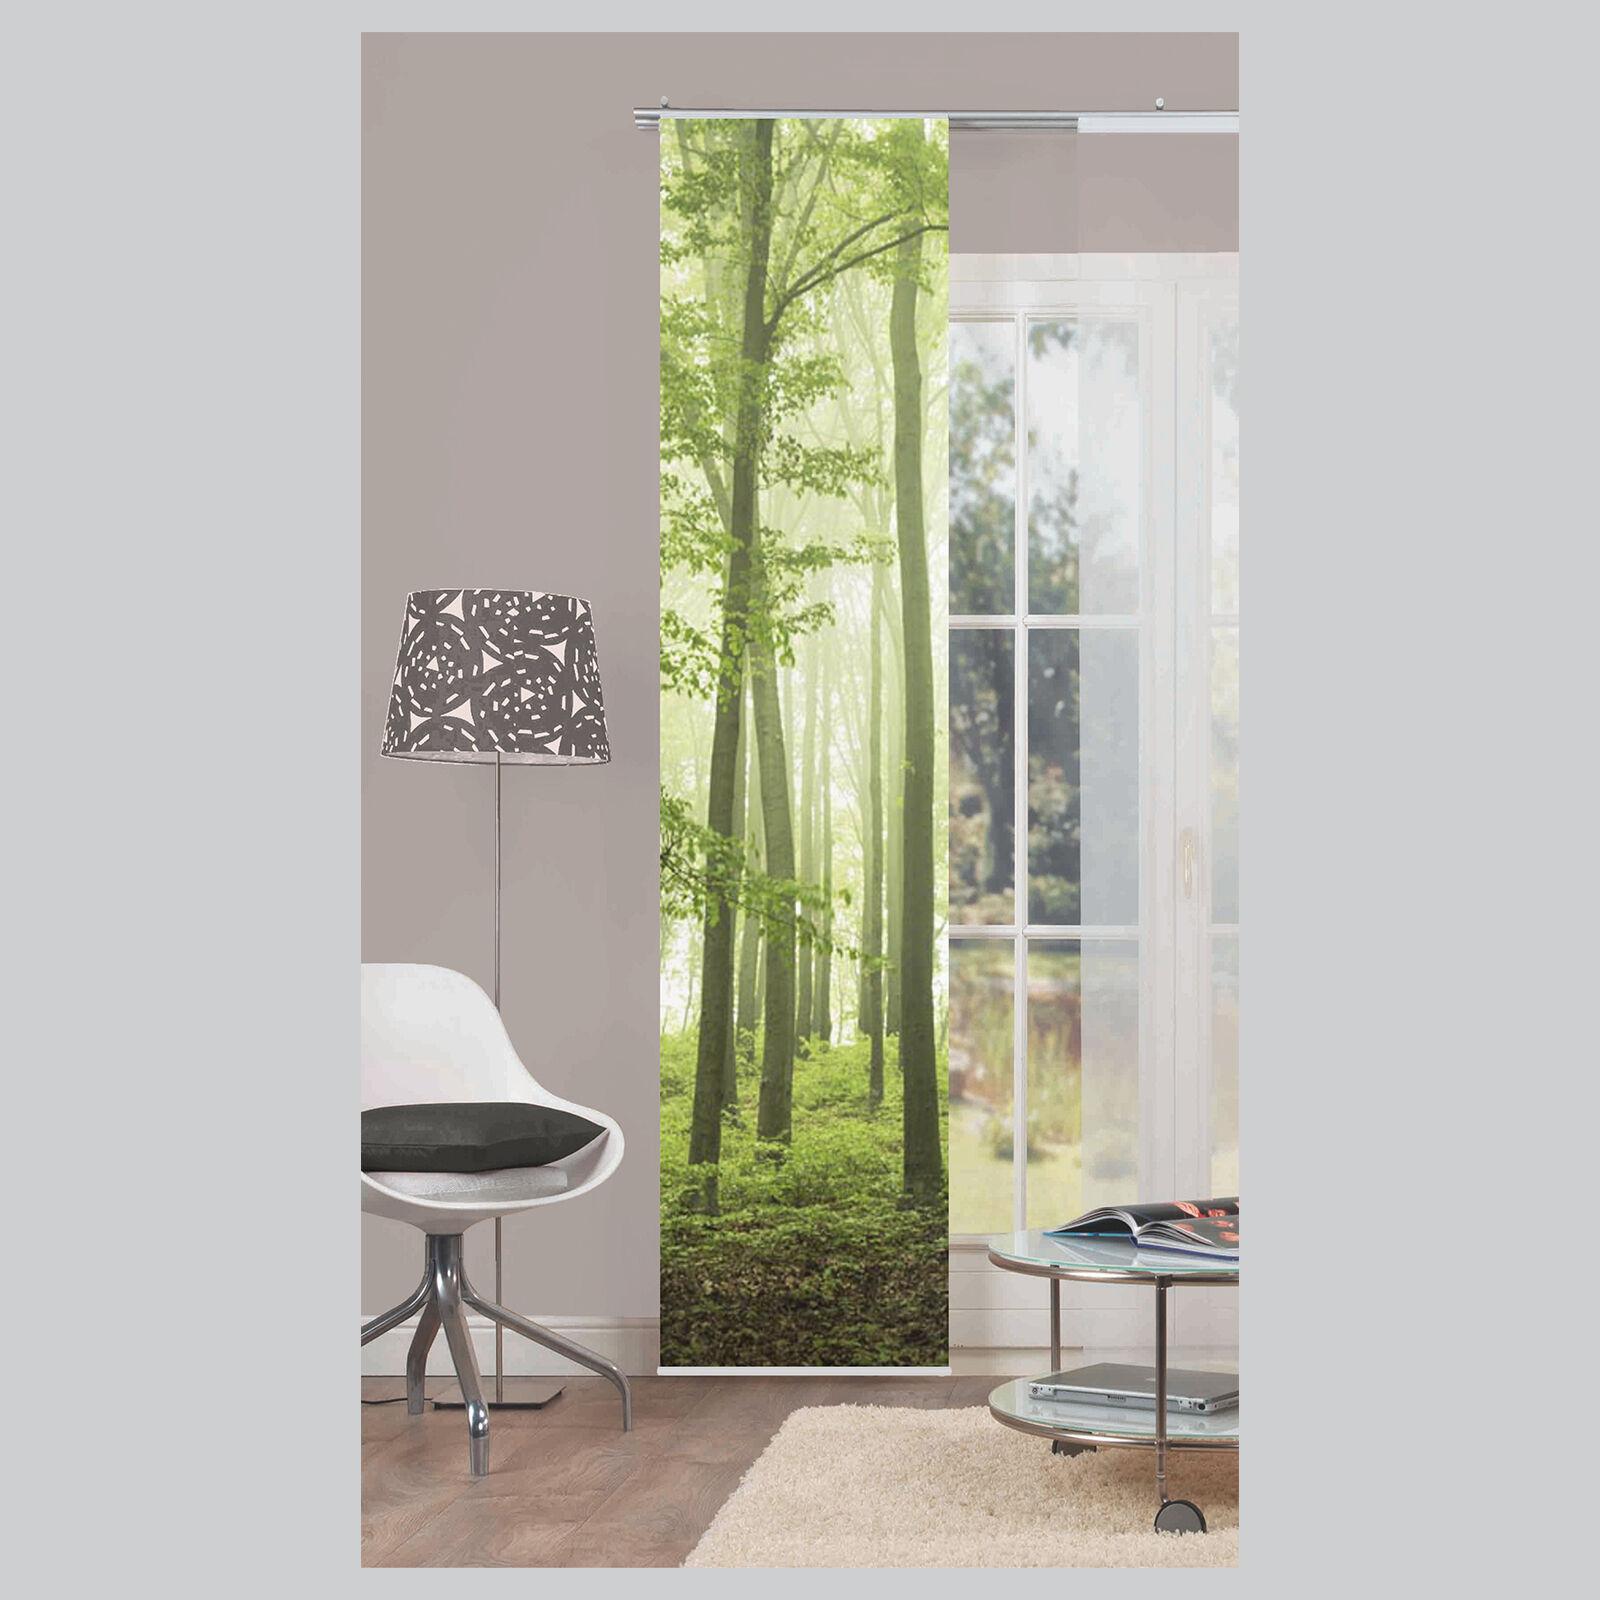 aaa nebelwald b ume schiebevorhang schiebegardine raumteiler home wohnideen ebay. Black Bedroom Furniture Sets. Home Design Ideas